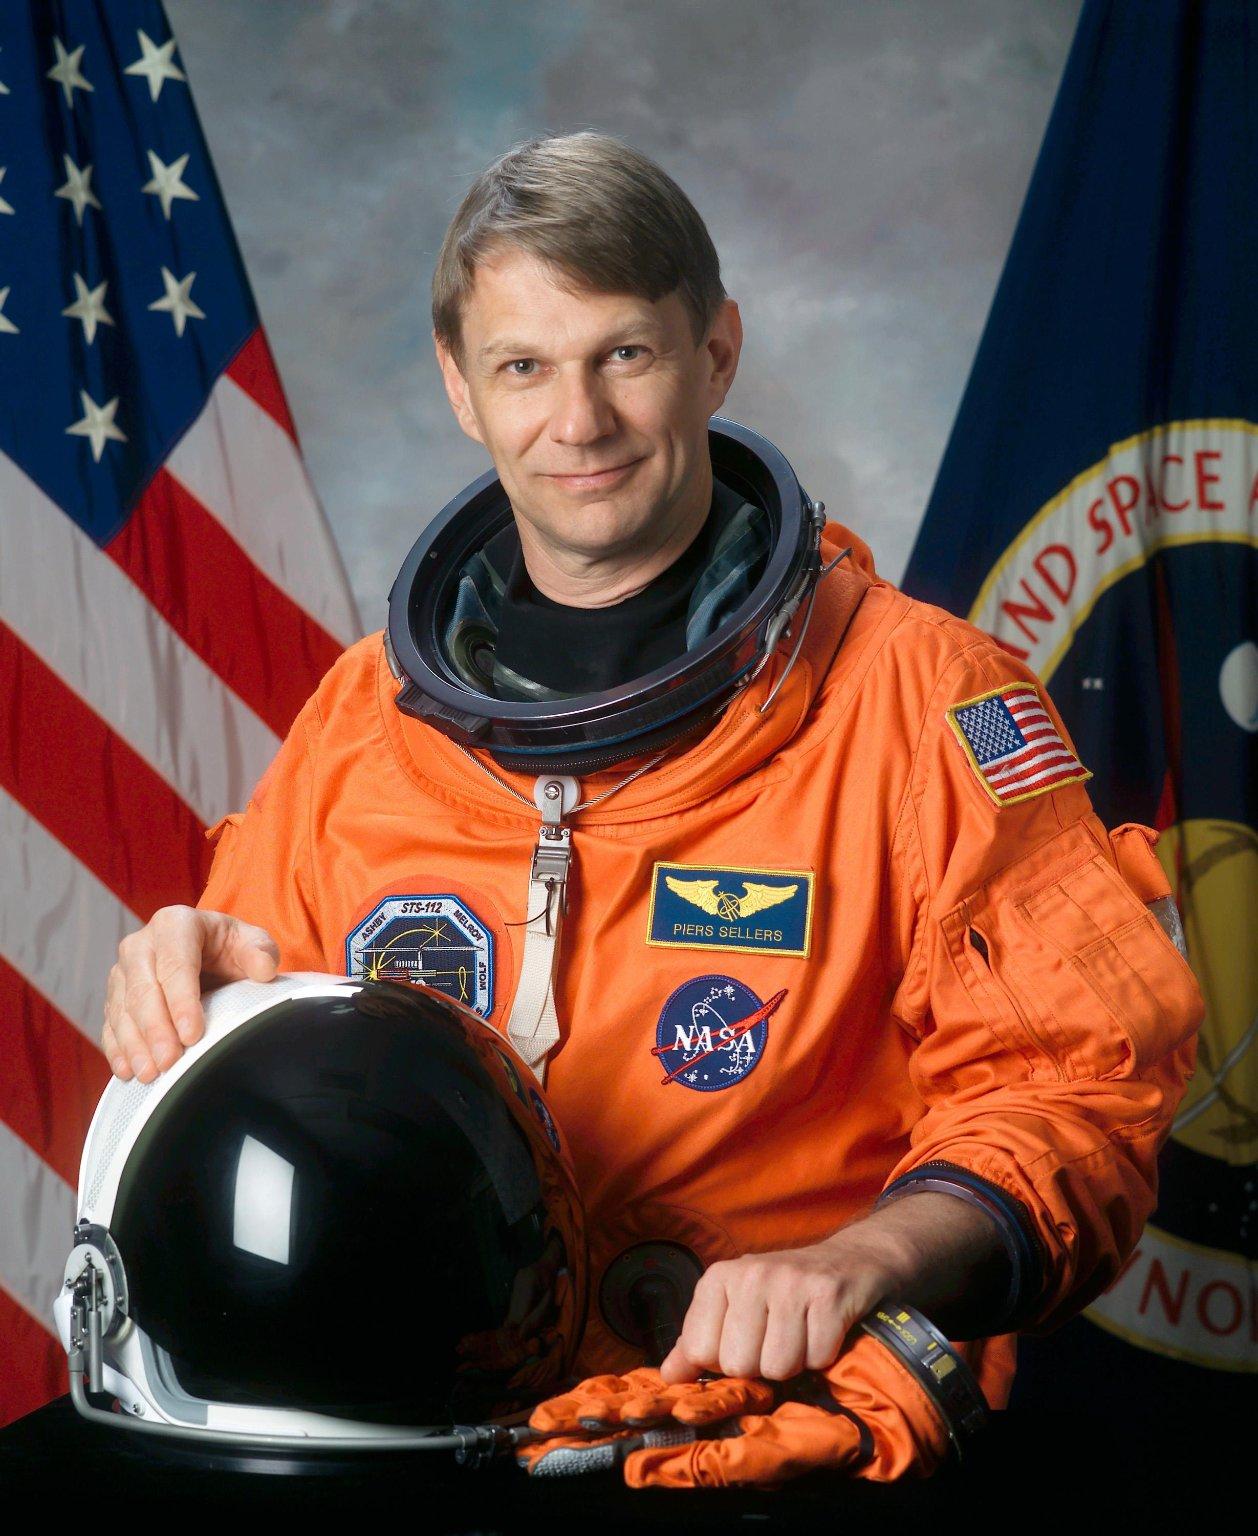 NASA Remembers Its Fallen Heroes.